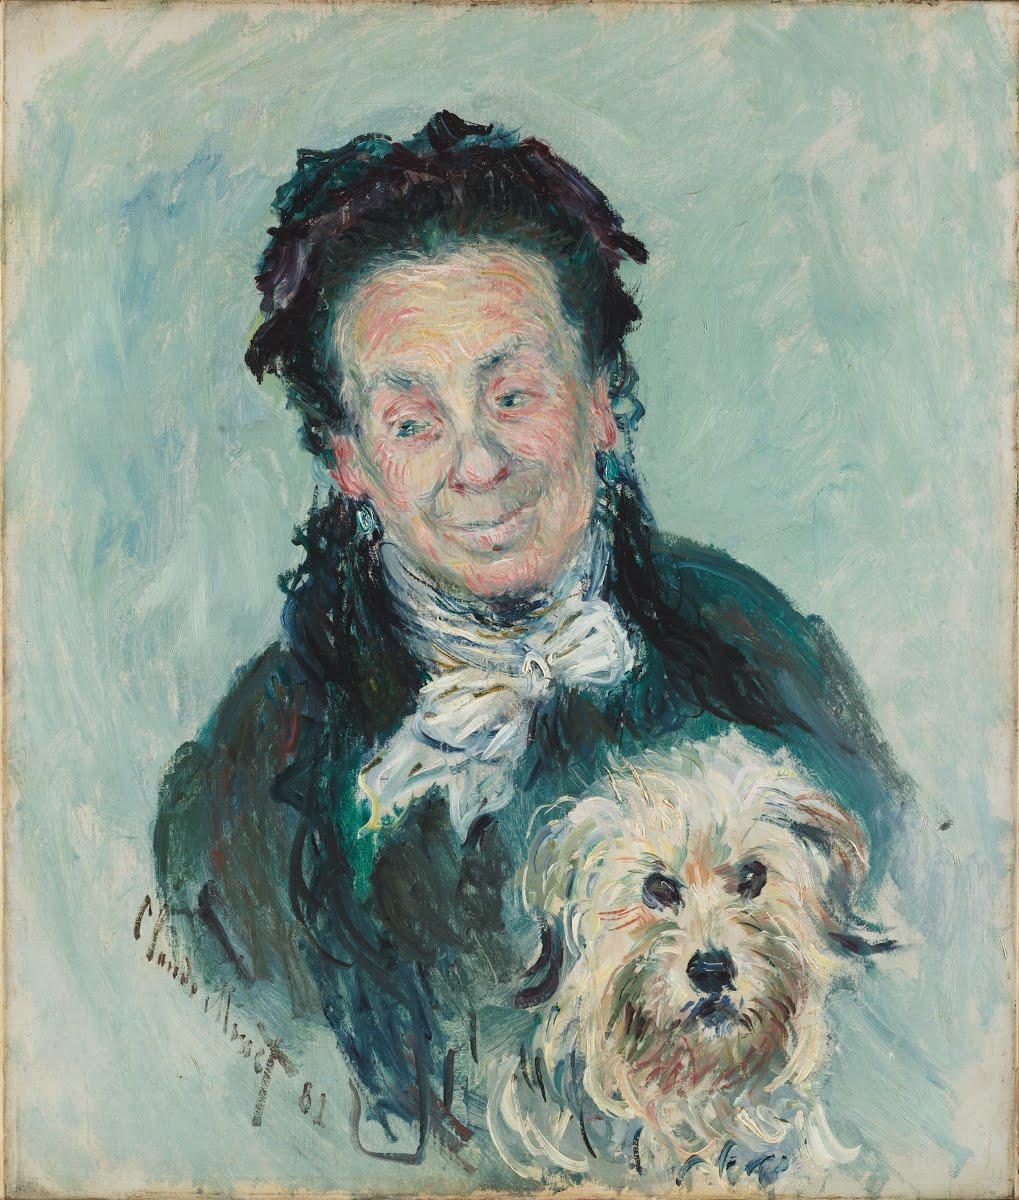 Eugénie Graff (Madame Paul) - Claude Monet — Google Arts & Culture